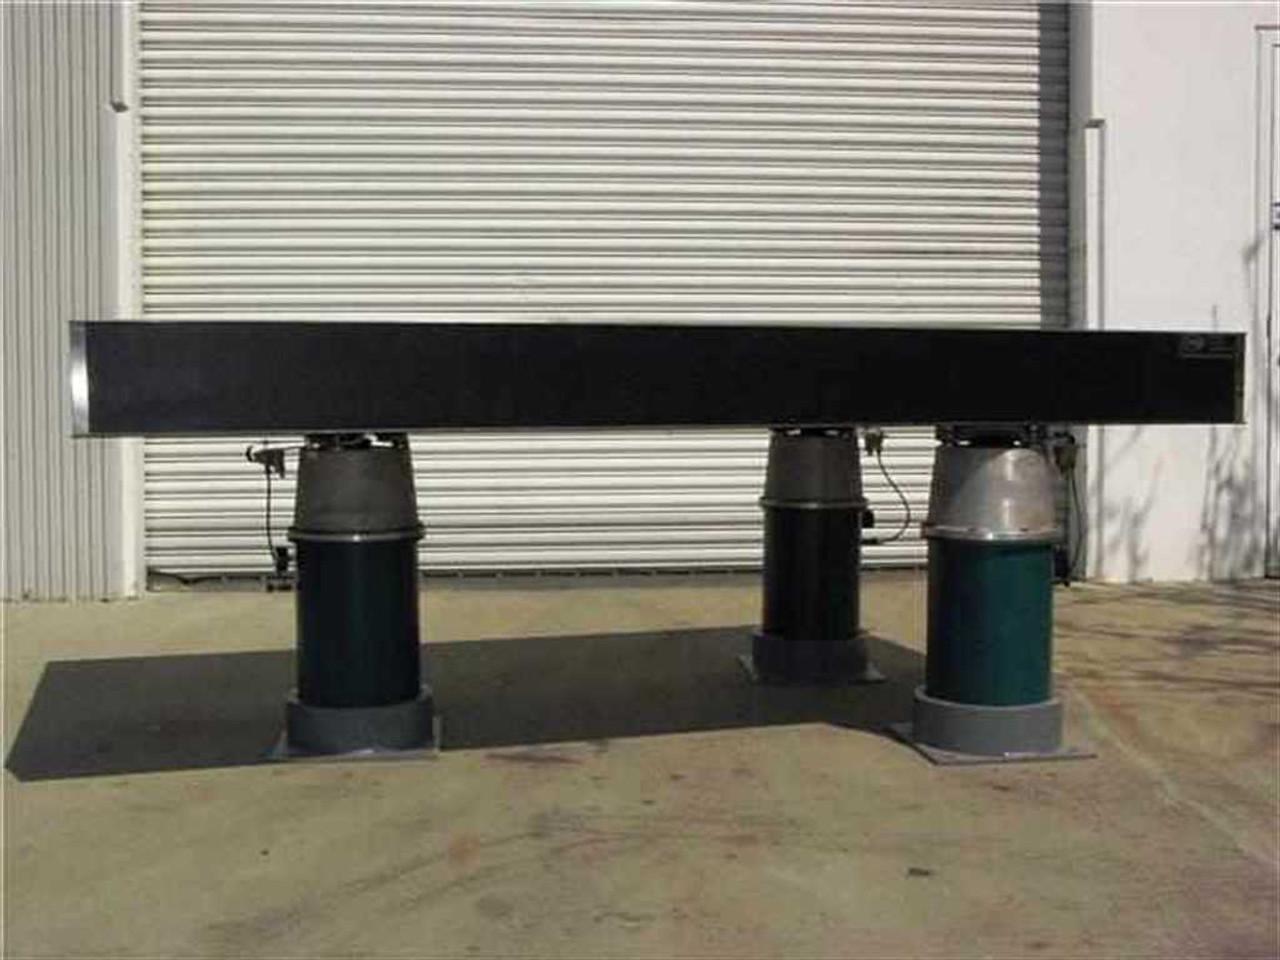 Newport Nrc 8 X 4 X 8 Quot Vibration Isolation Breadboard